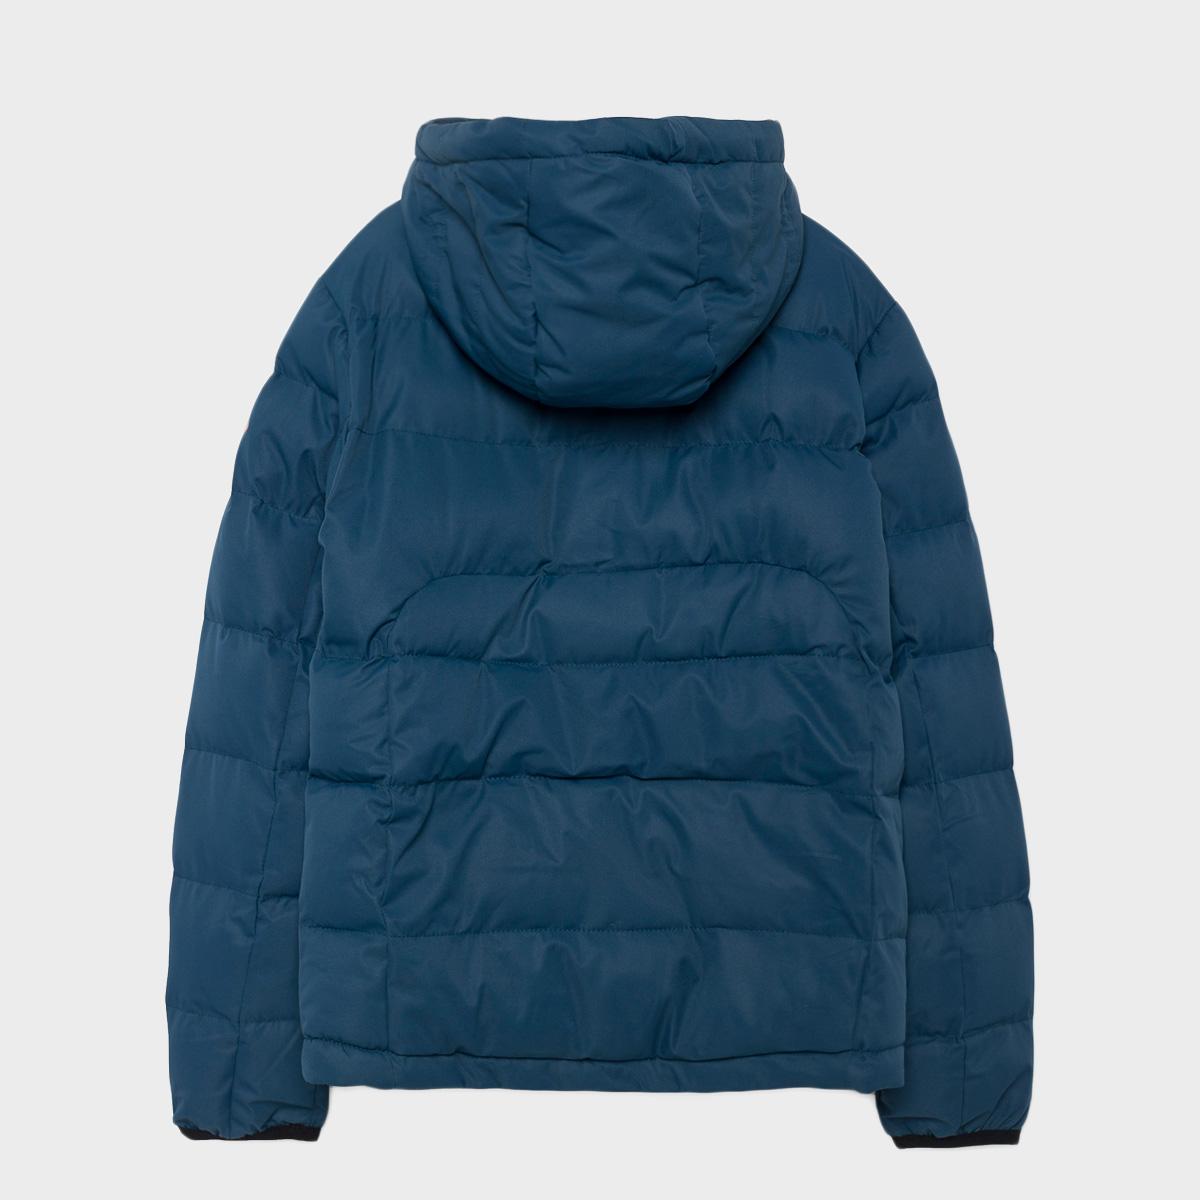 AMPRIU KIDS MOUNT-LOFT PADDED BLUE